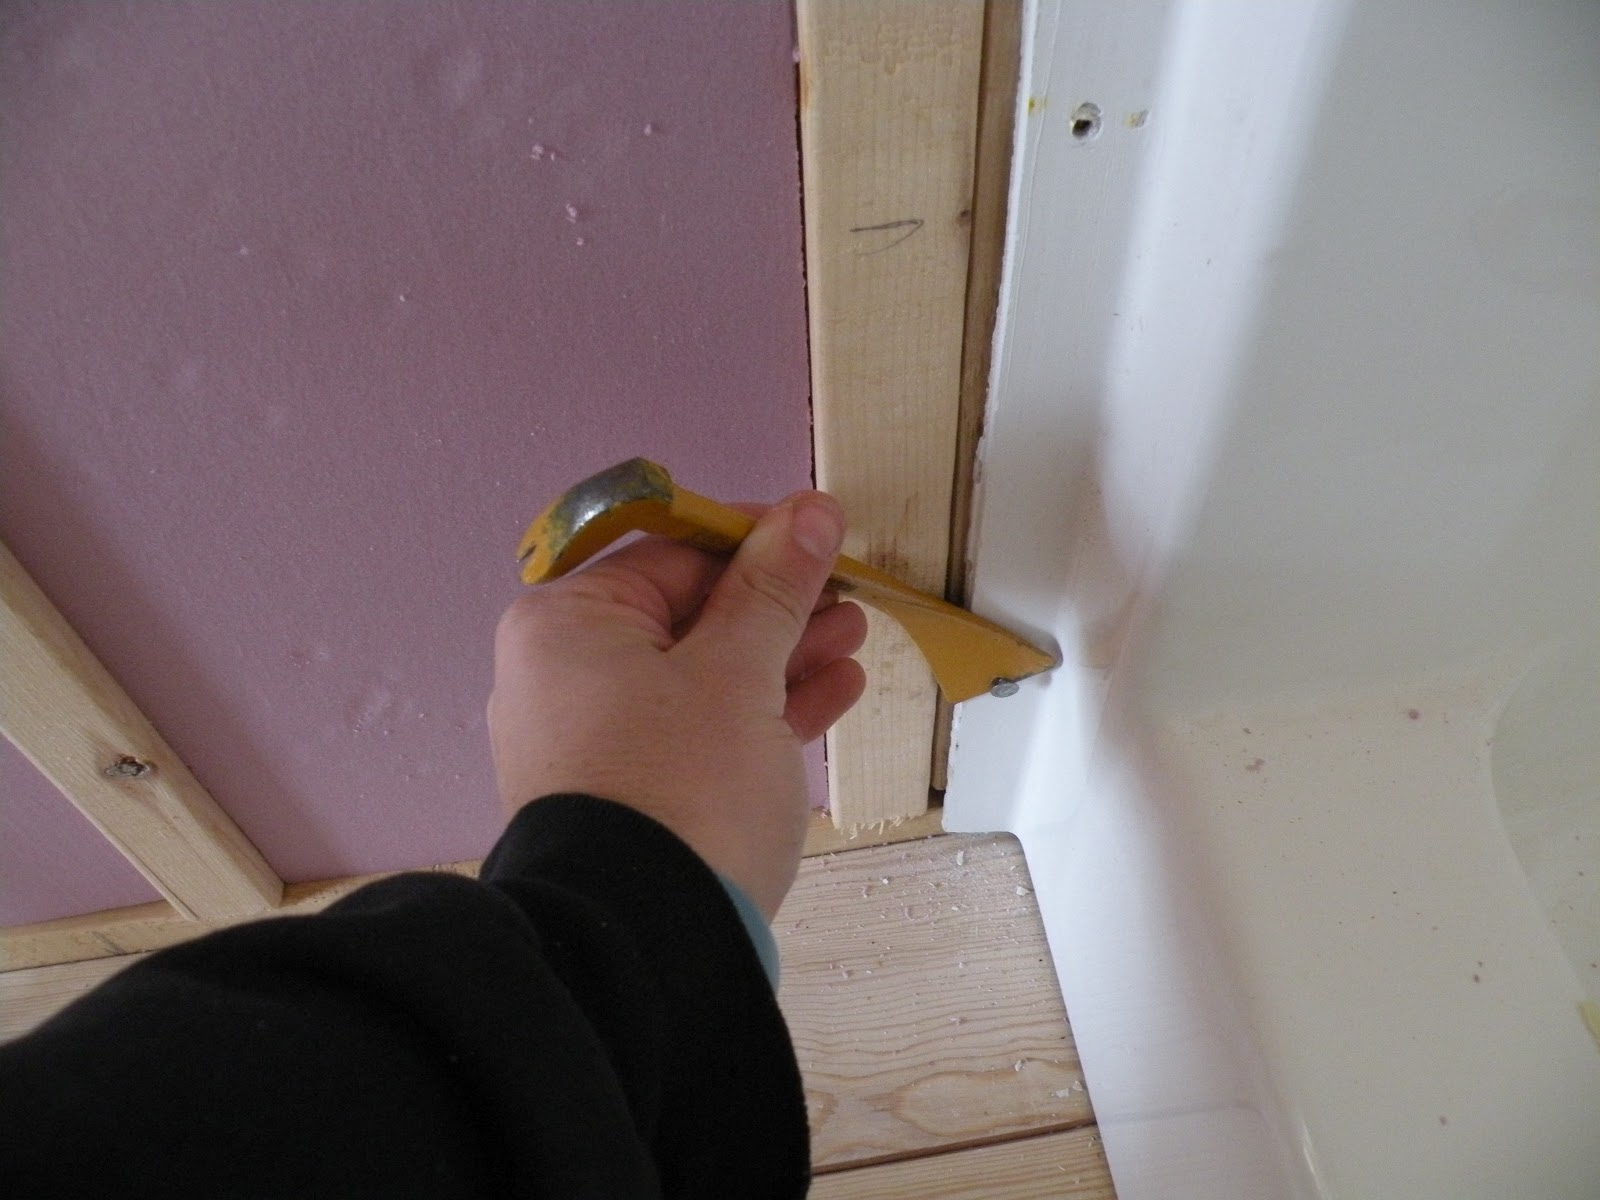 Bathroom Stall Crack Cover house for a hobo: february 2012